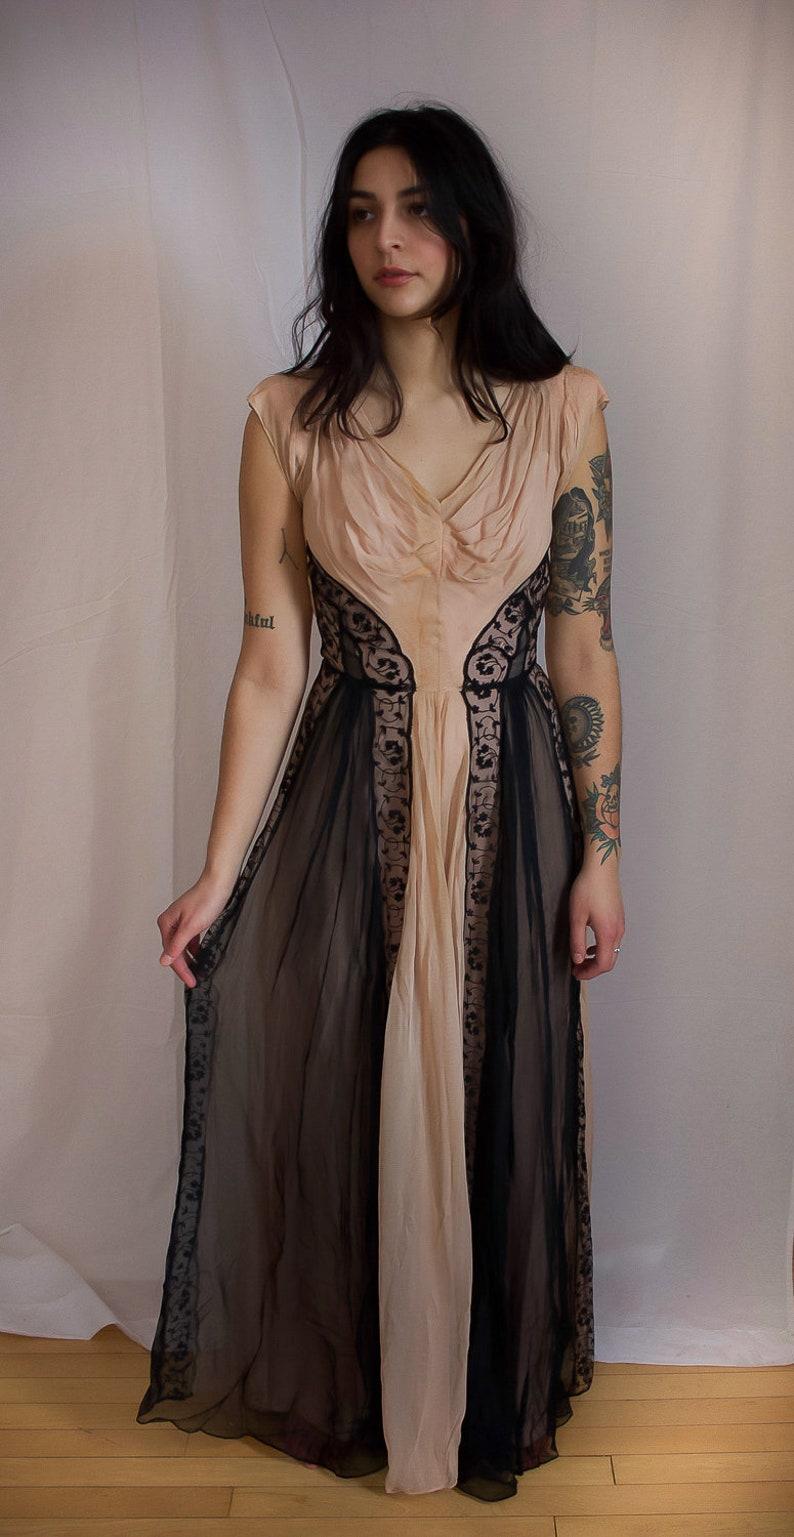 Edwardian Black and Blush Gown Antique Titanic Era